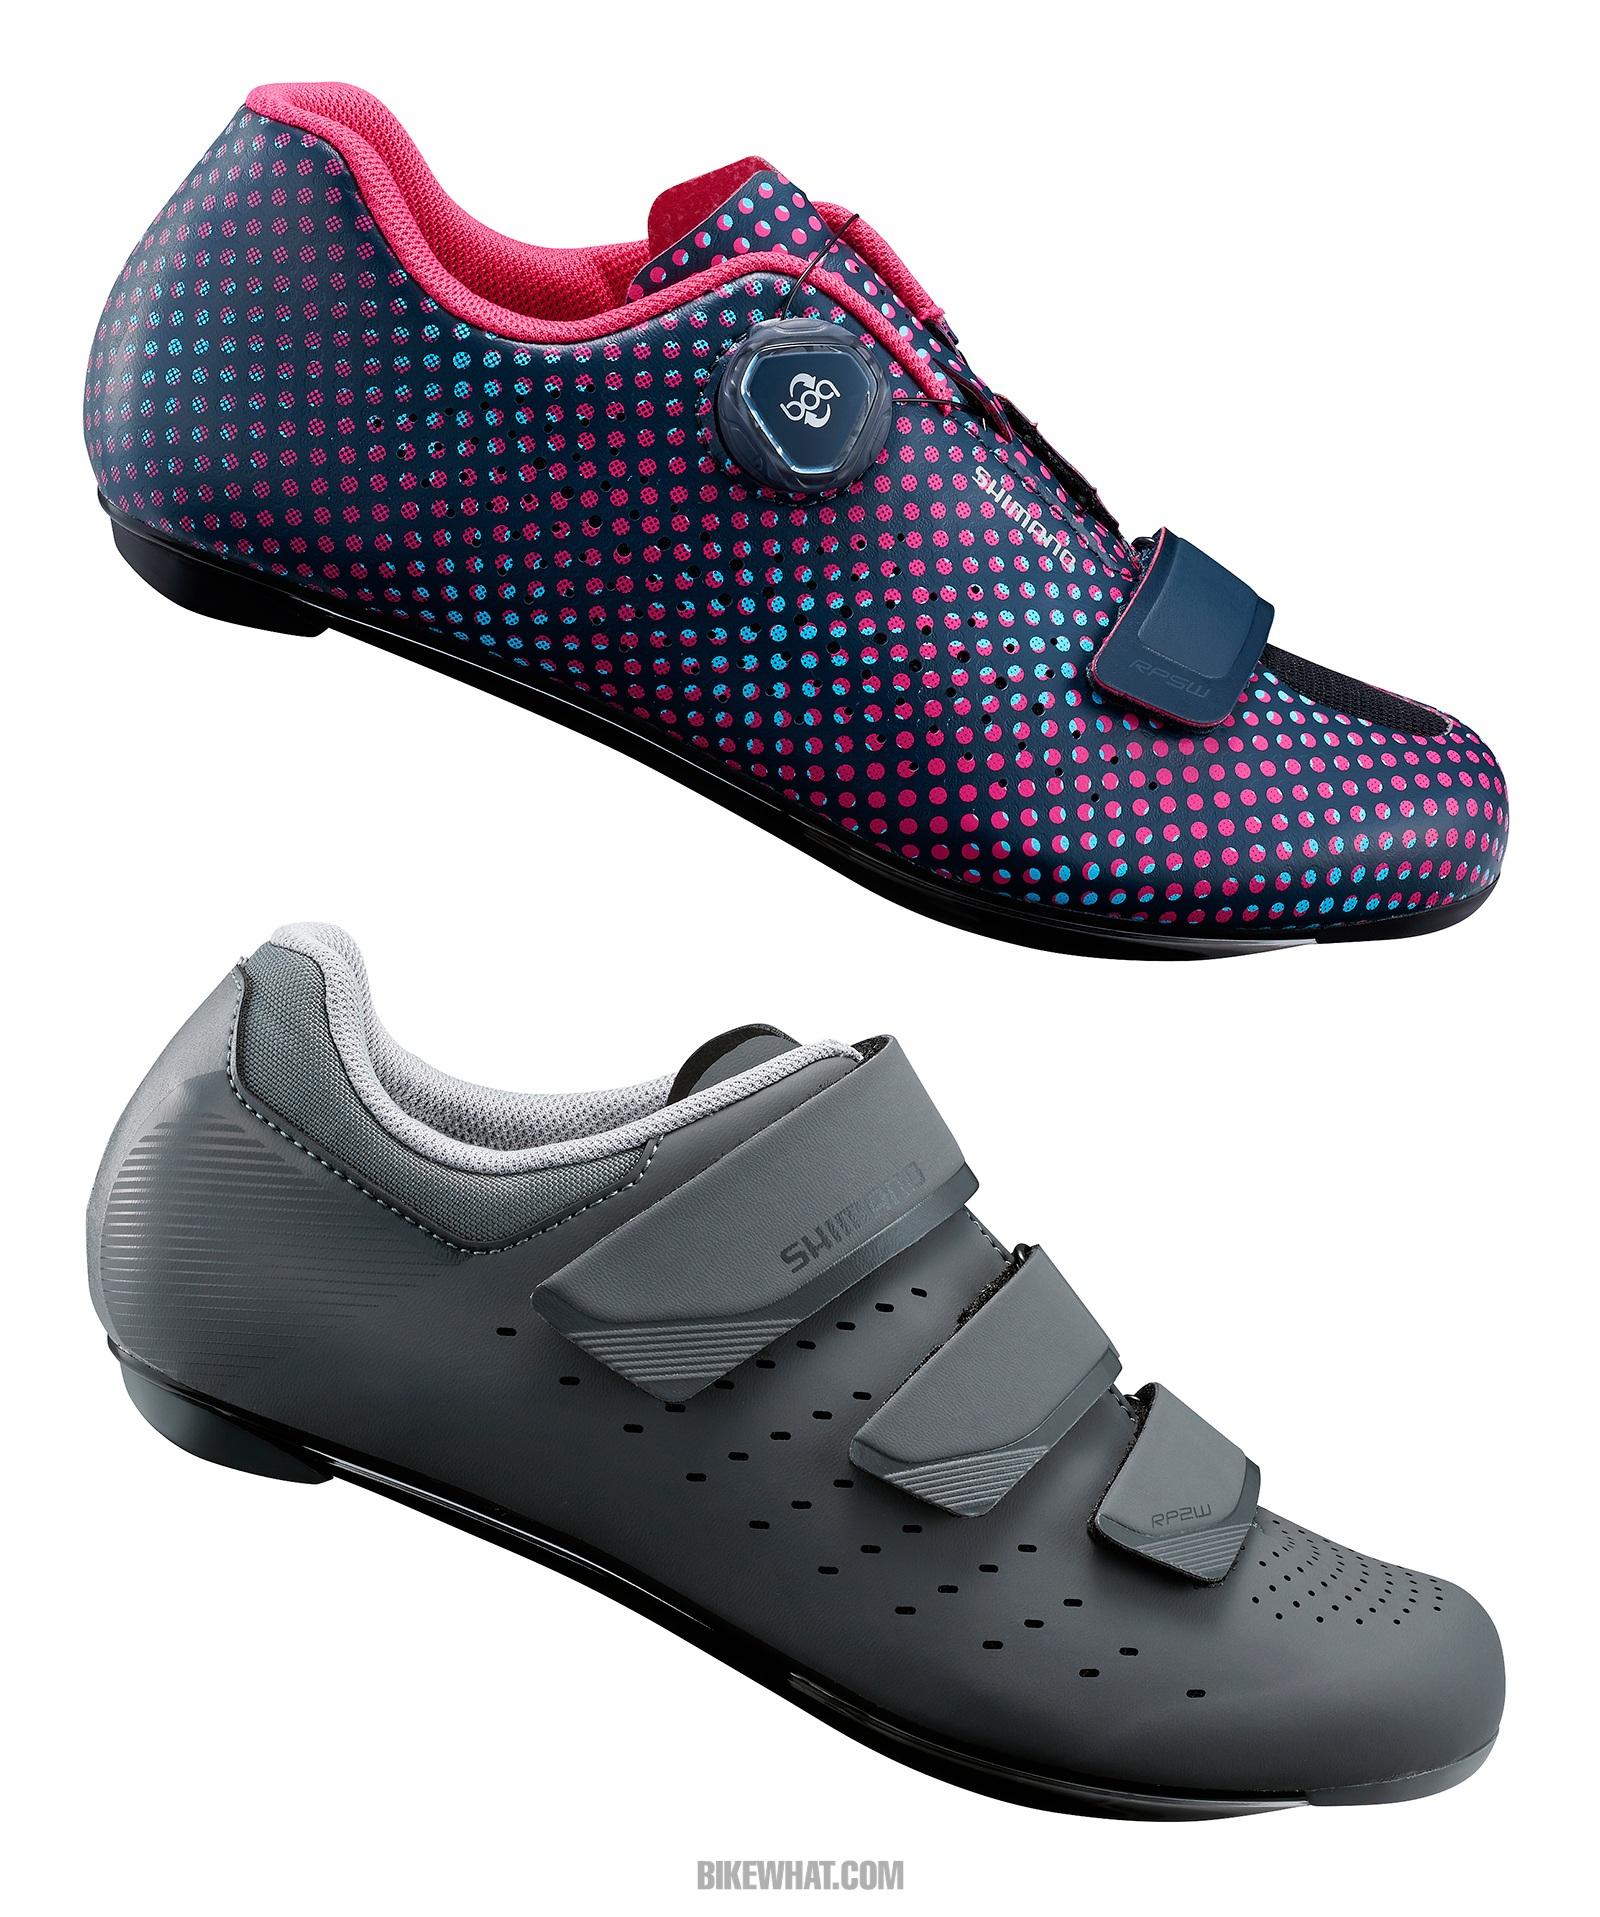 Shimano_Shoes_08.jpg